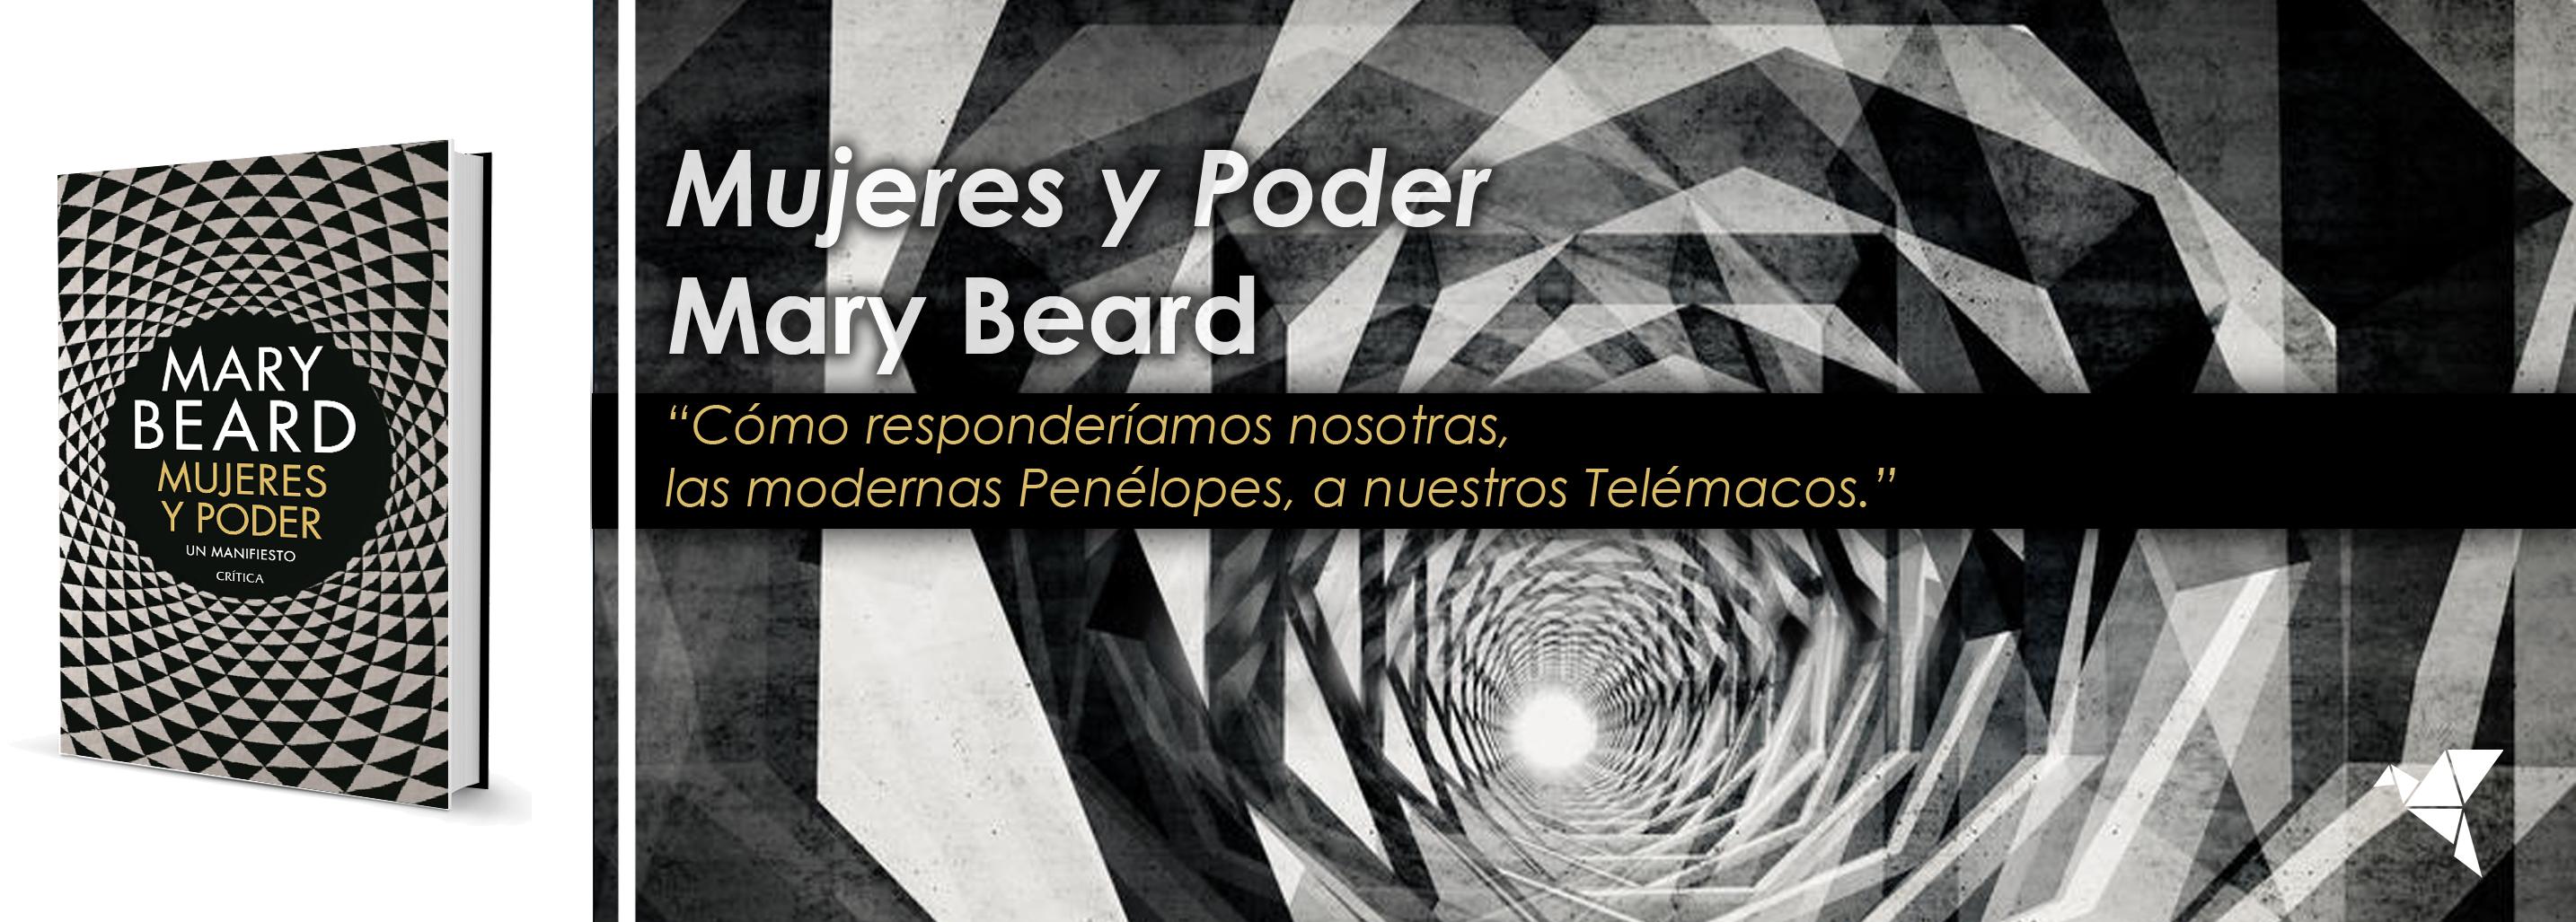 Mujeres y poder, de Mary Beard